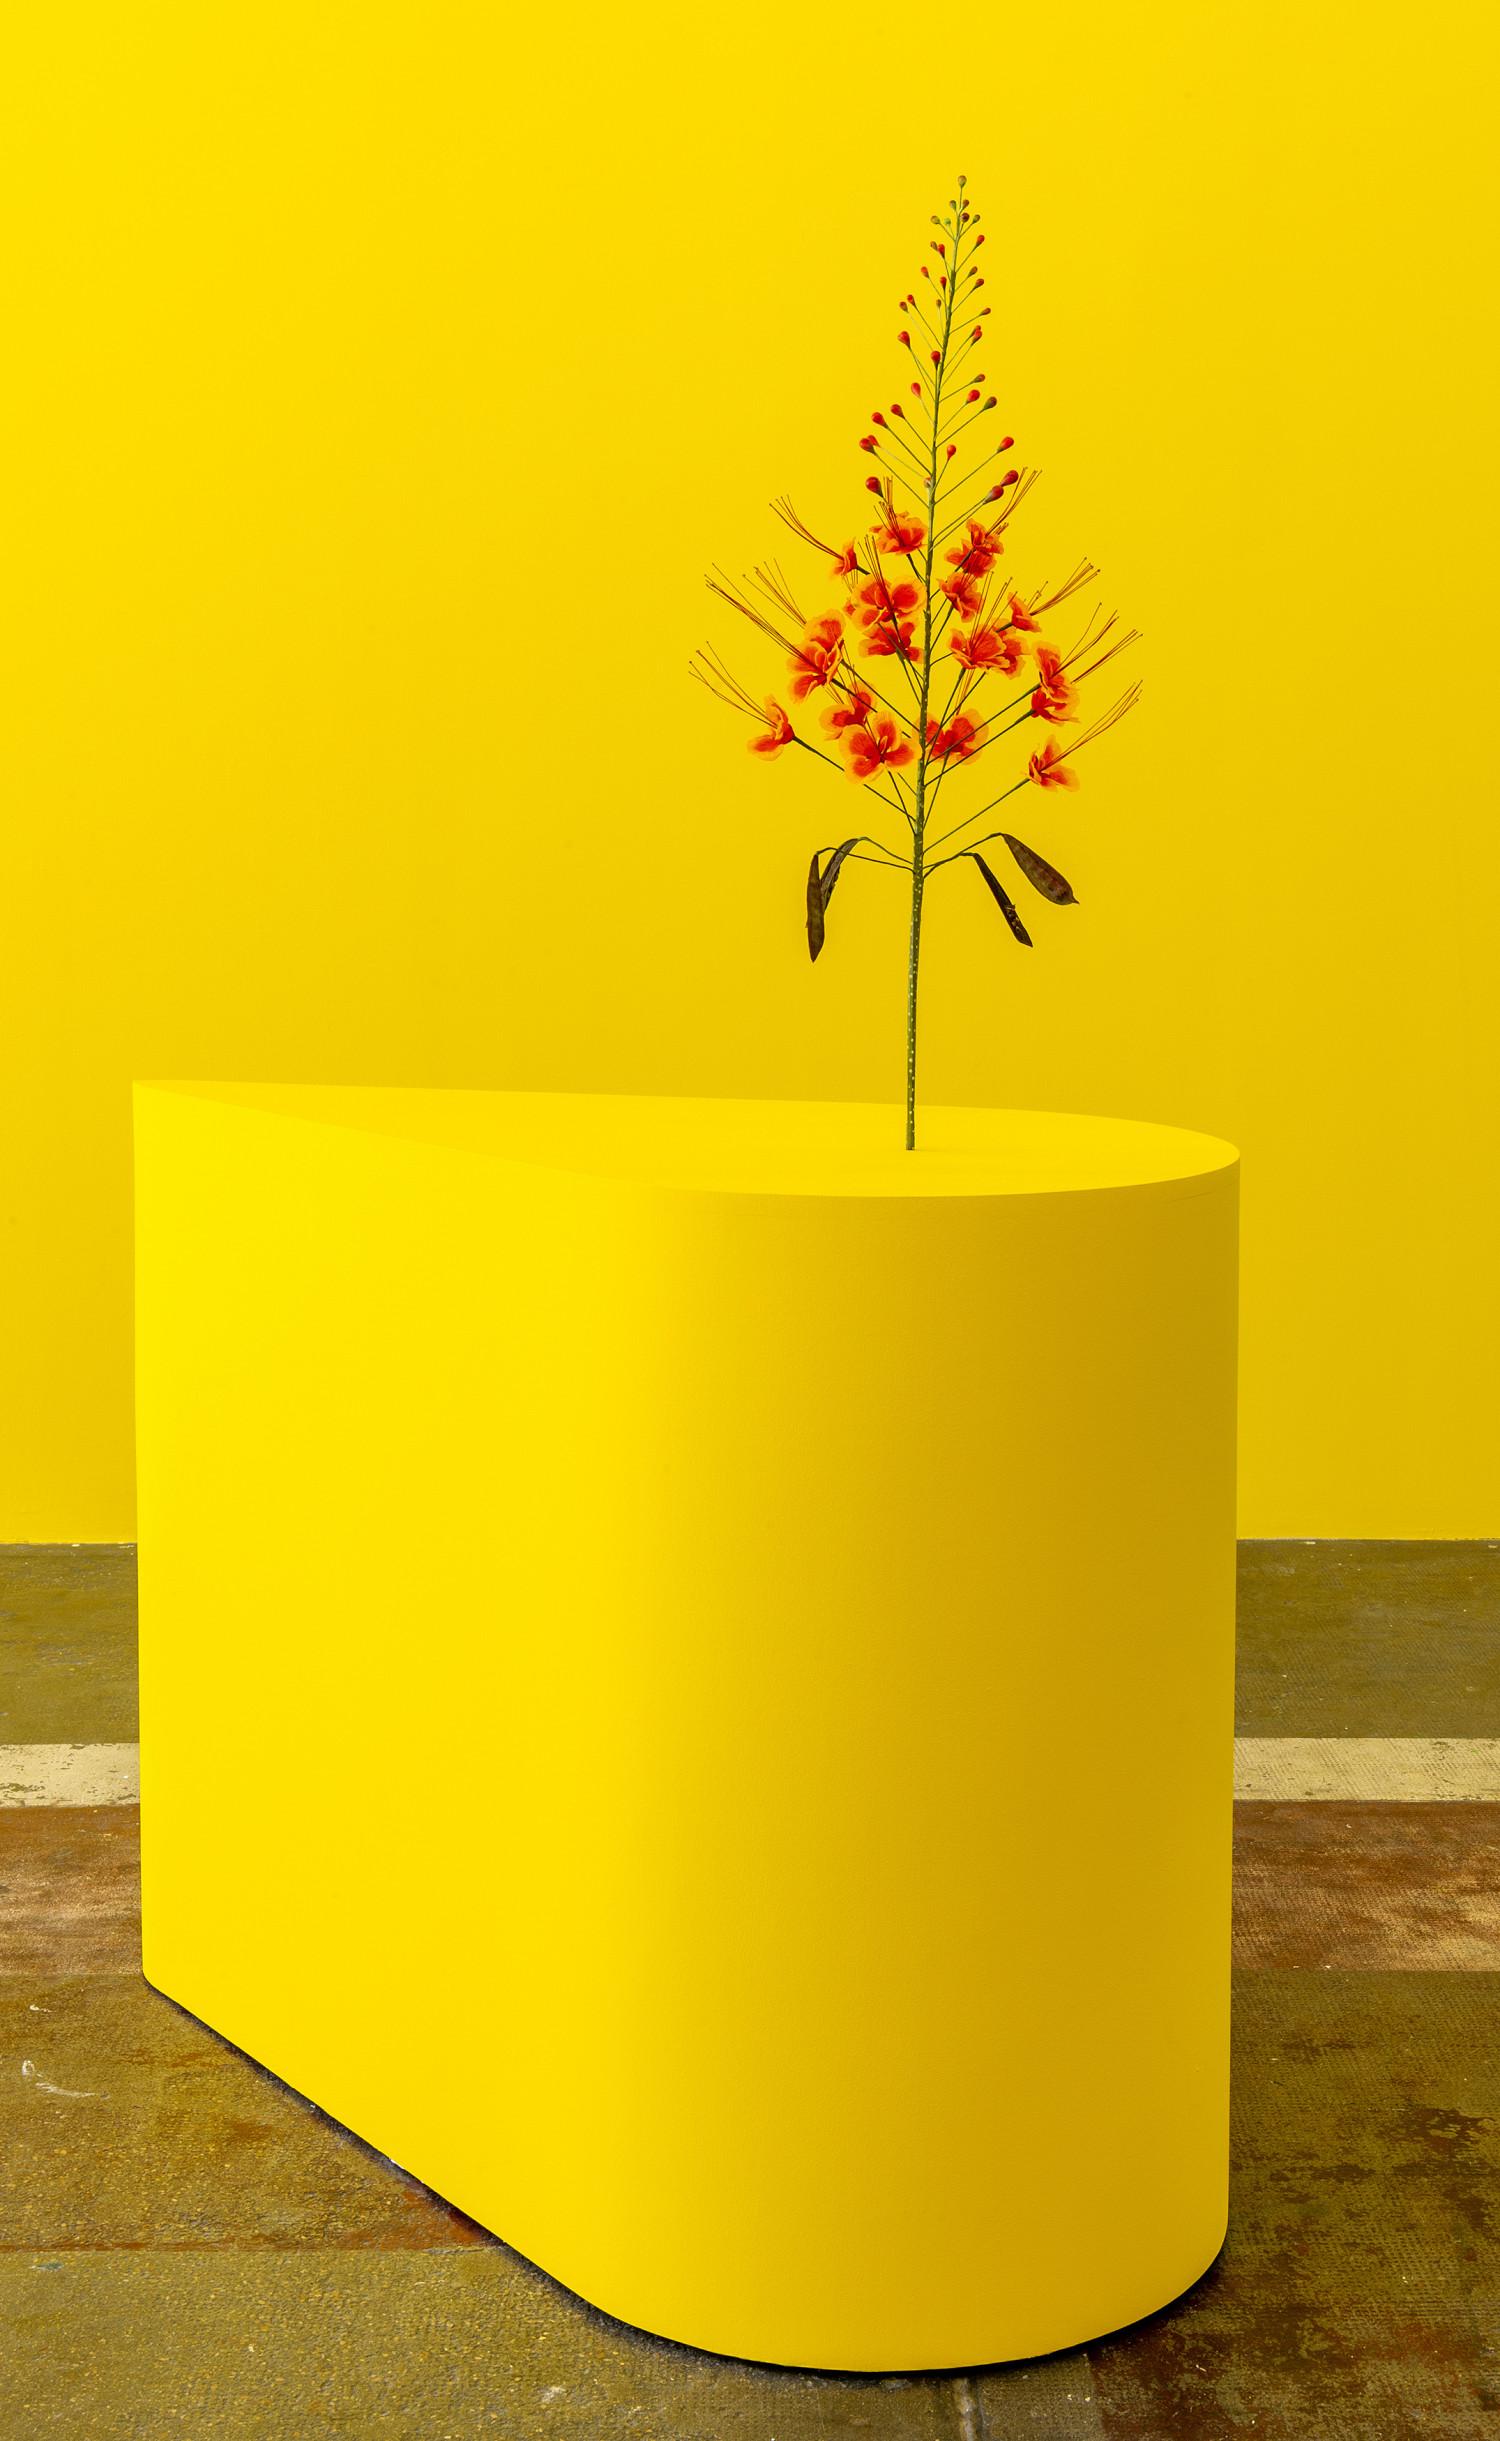 Blomsten i Kunsten. Kapwani Kiwanga, The Marias, 2020. Courtesy Centre d'art contemporaine d'Ivry – le Crédac, kunstneren og Galerie Tanja Wagner, Berlin. Foto: Marc Domage